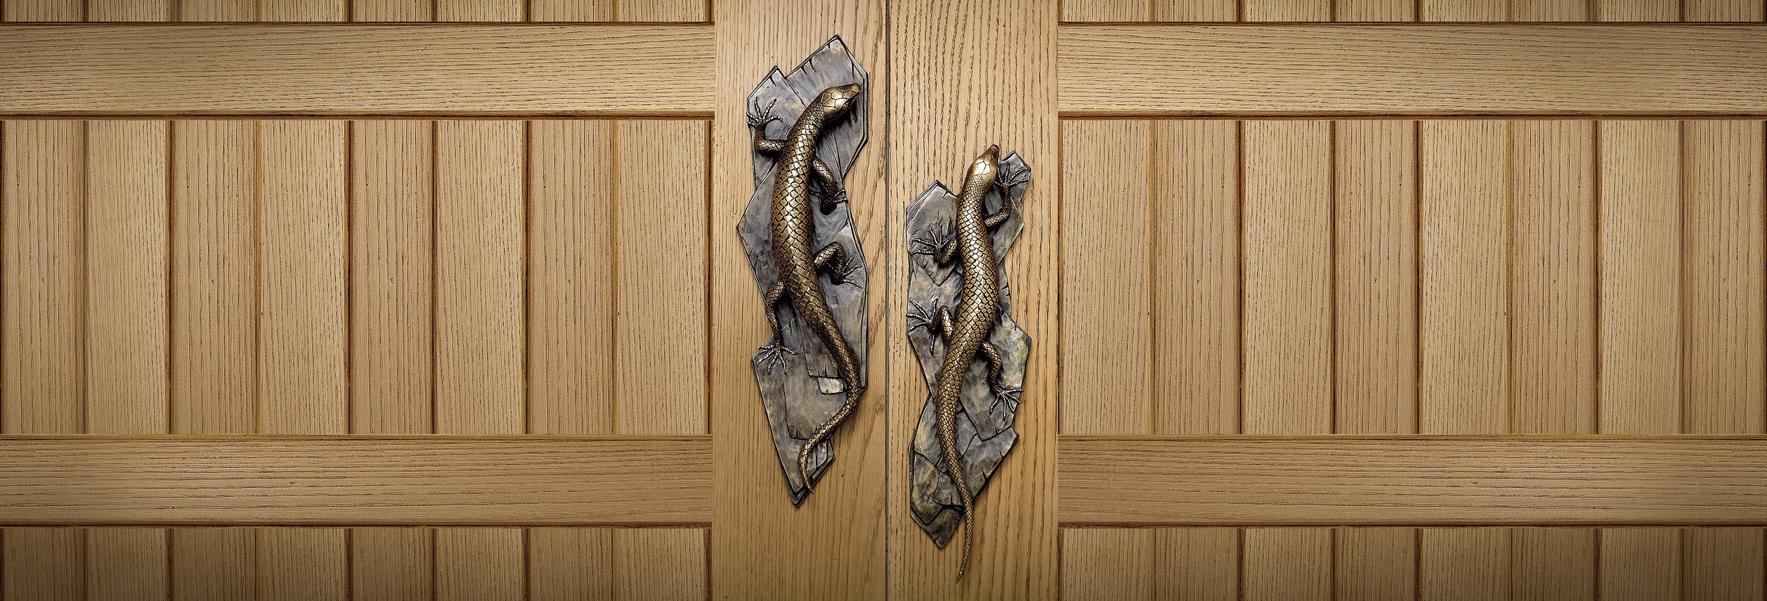 Martin Pierce - Custom Door Handles, Hardware, Knobs and Cabinet Pulls